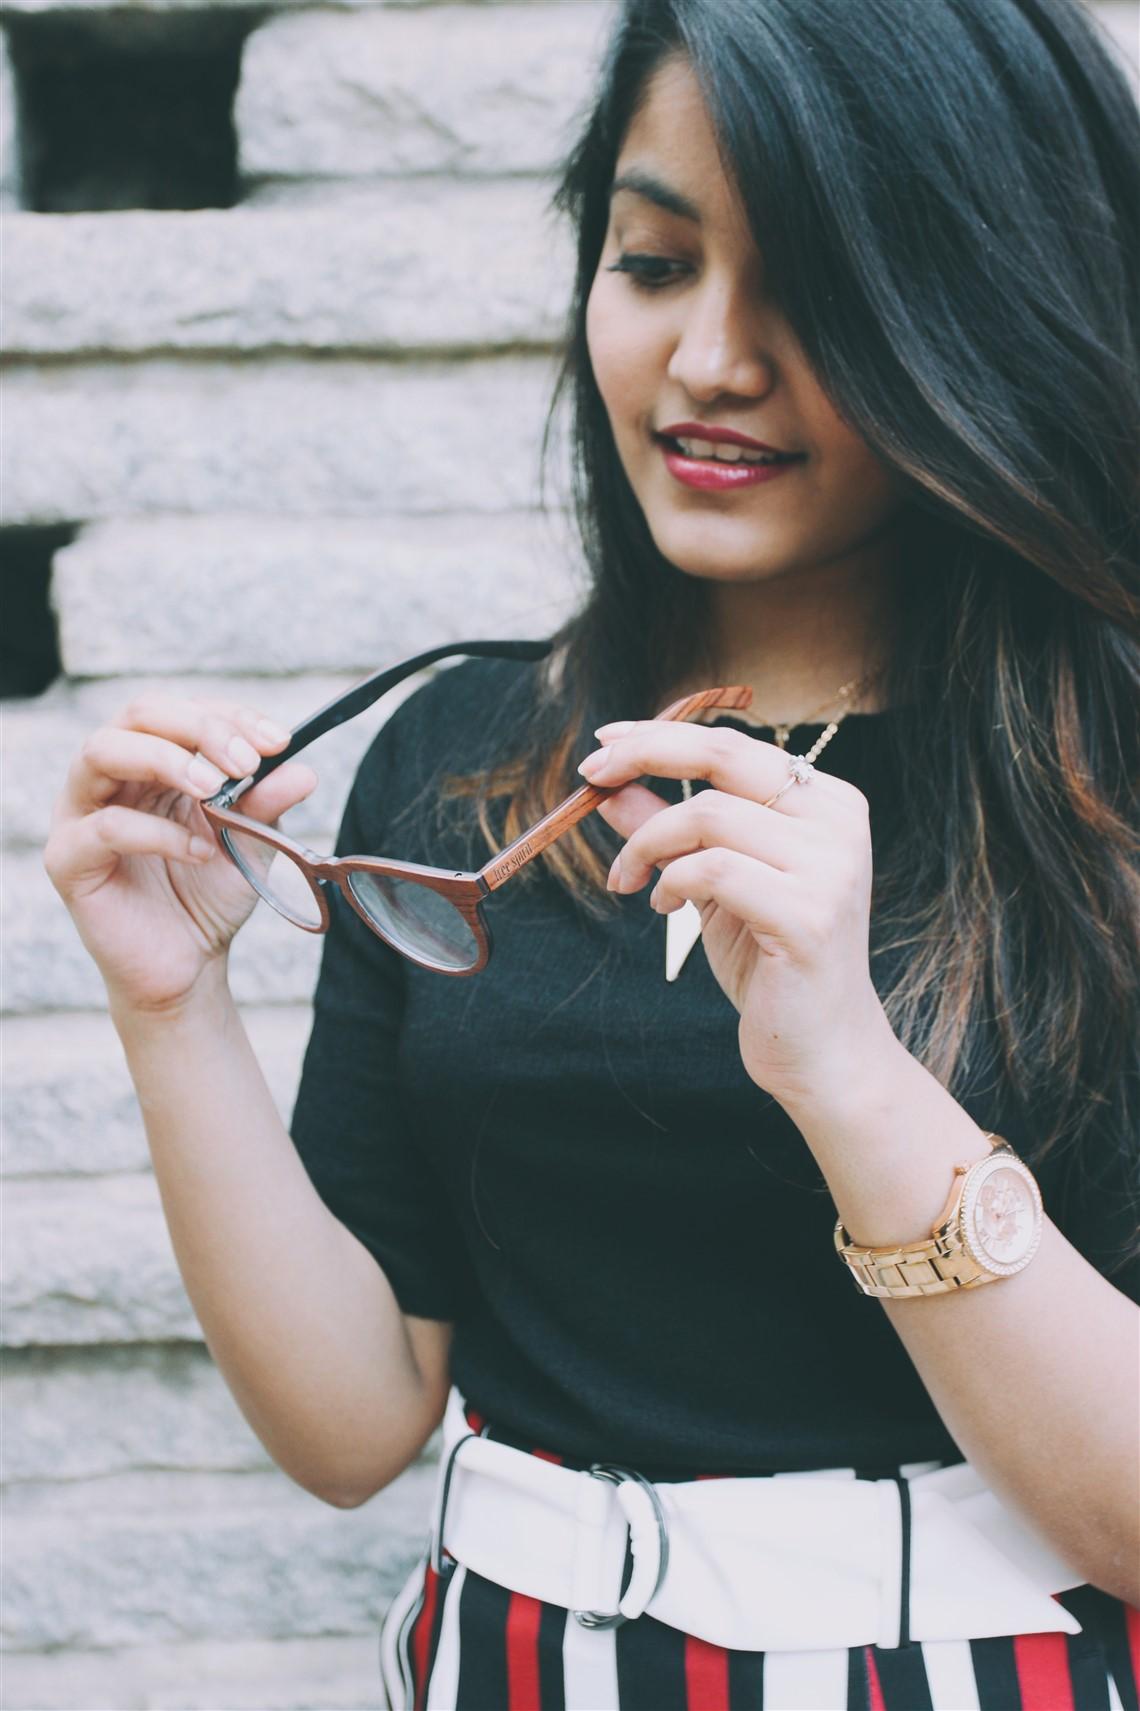 bangalore fashion blogger indian blogger princy mascarenhas the jeromy diaries x woodgeek